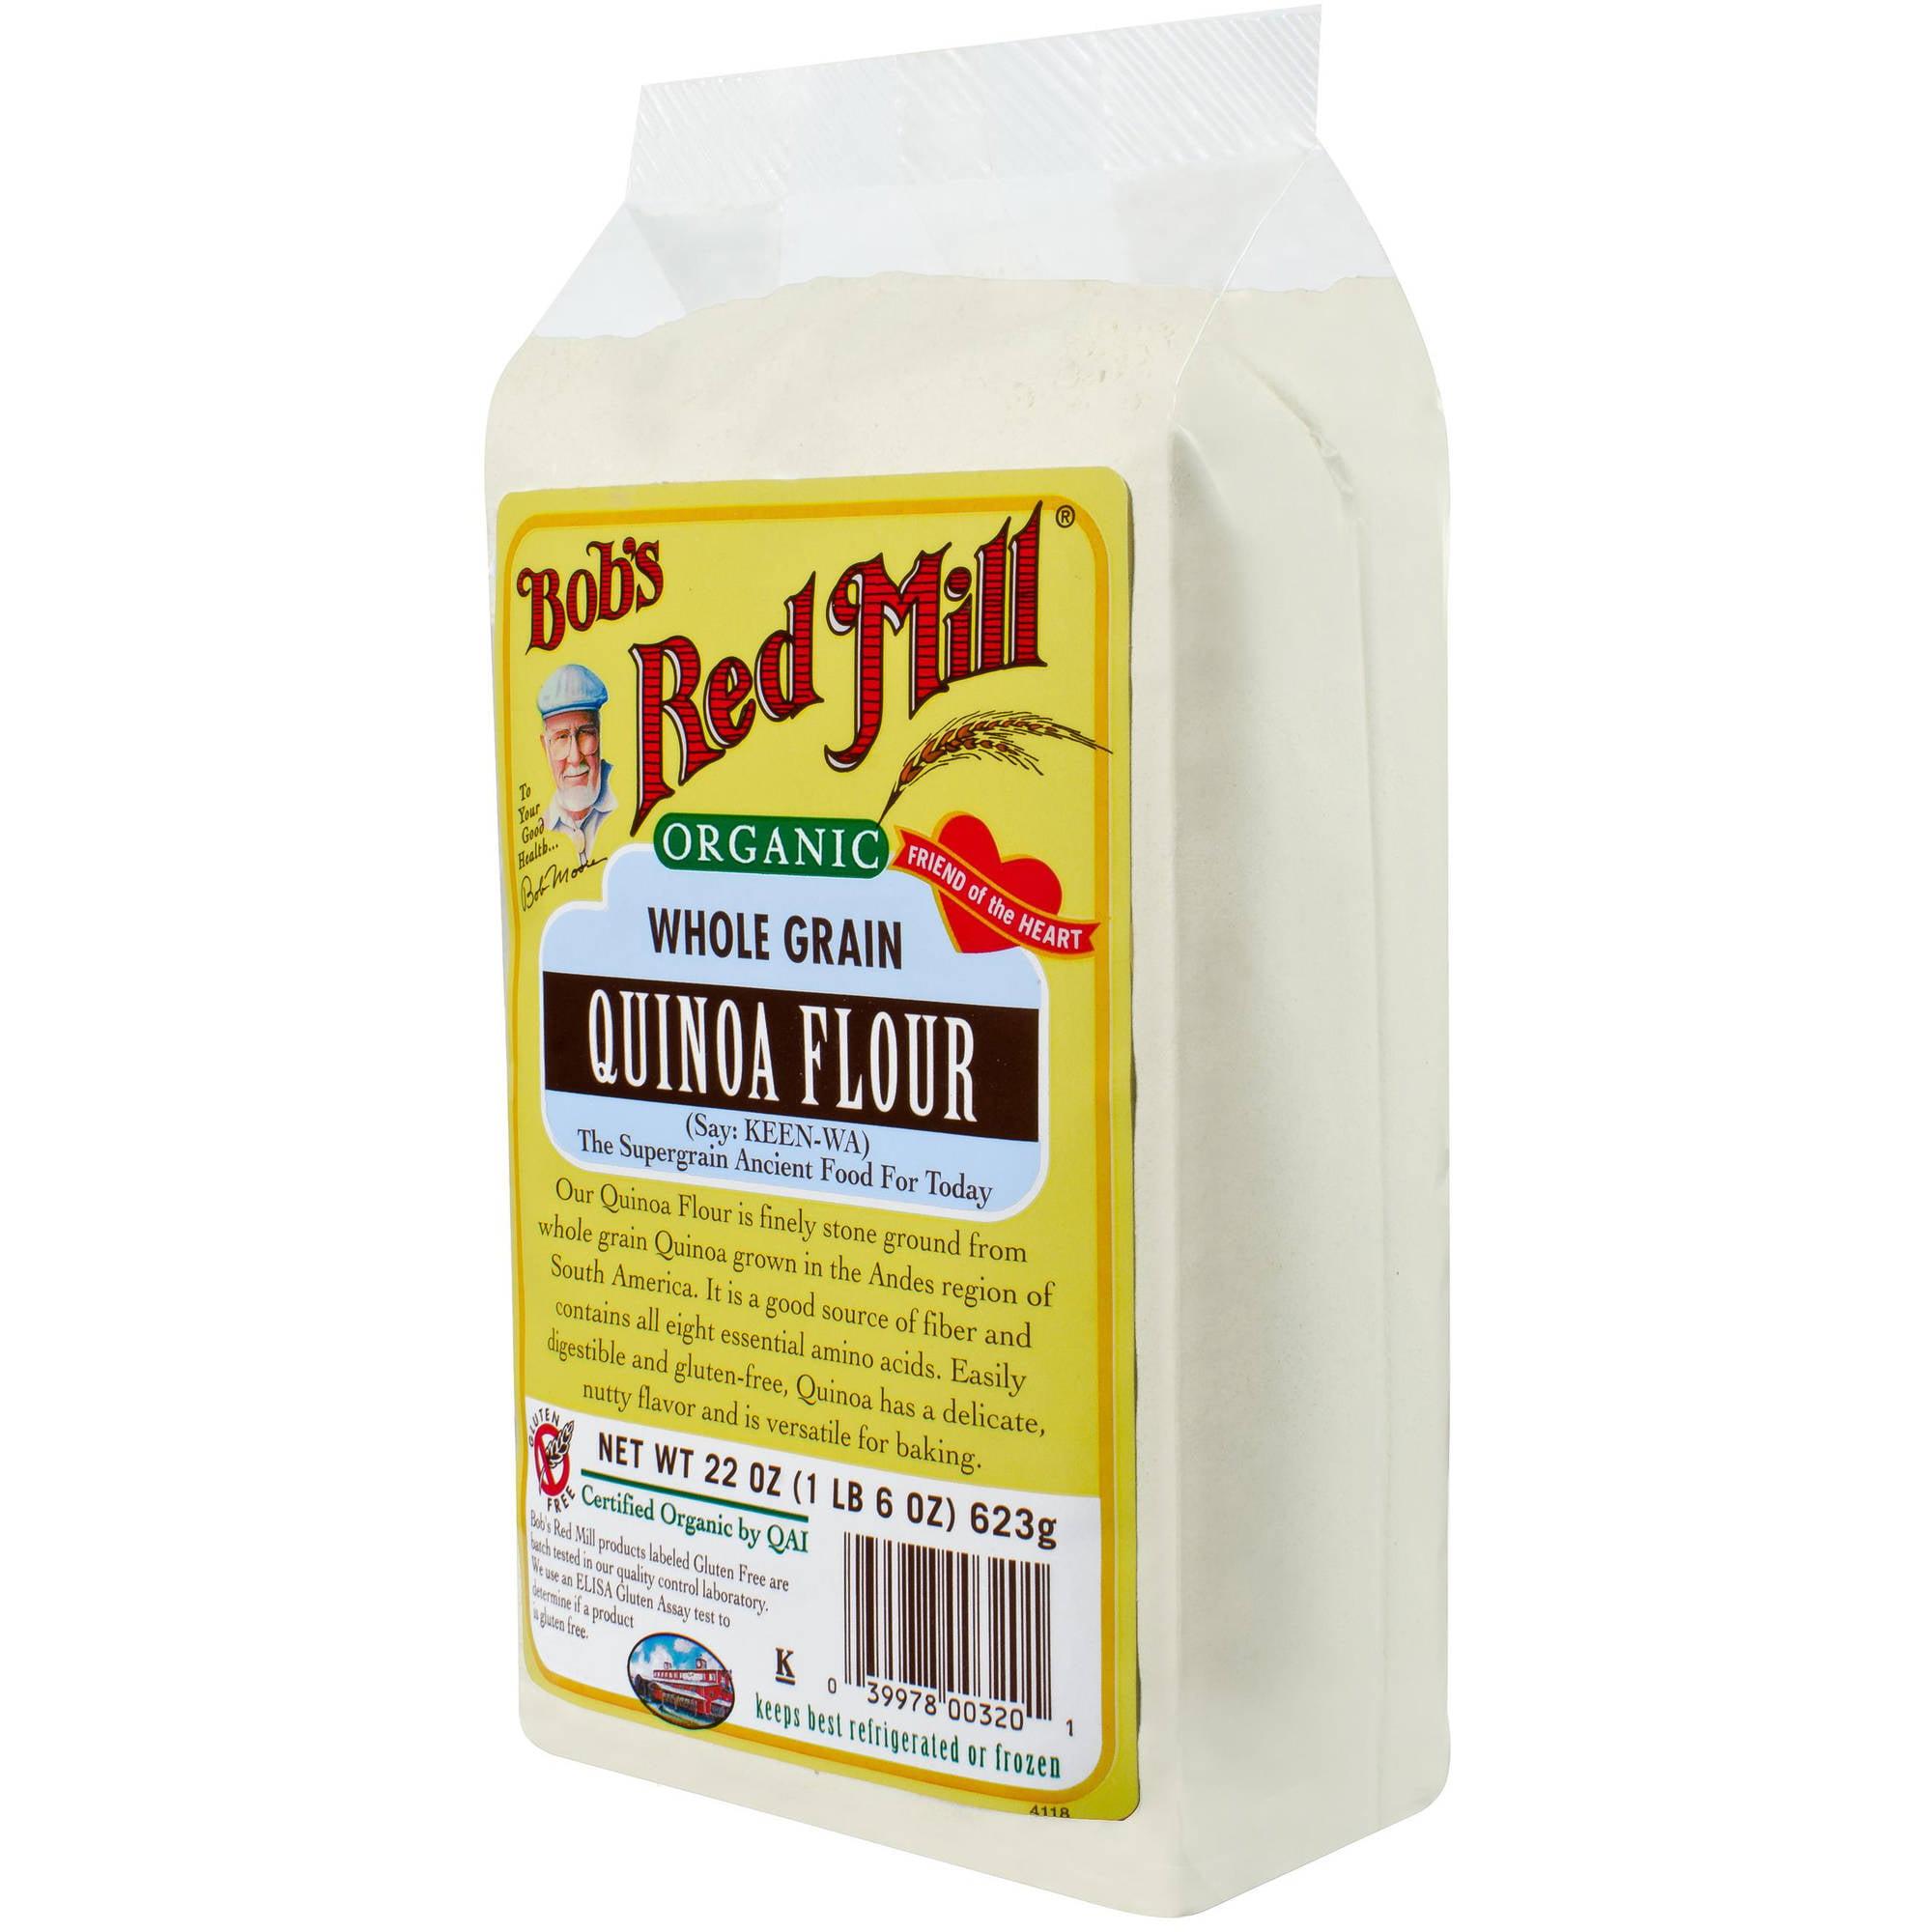 Bob's Red Mill Organic Whole Grain Quinoa Flour, 22 oz, (Pack of 4)